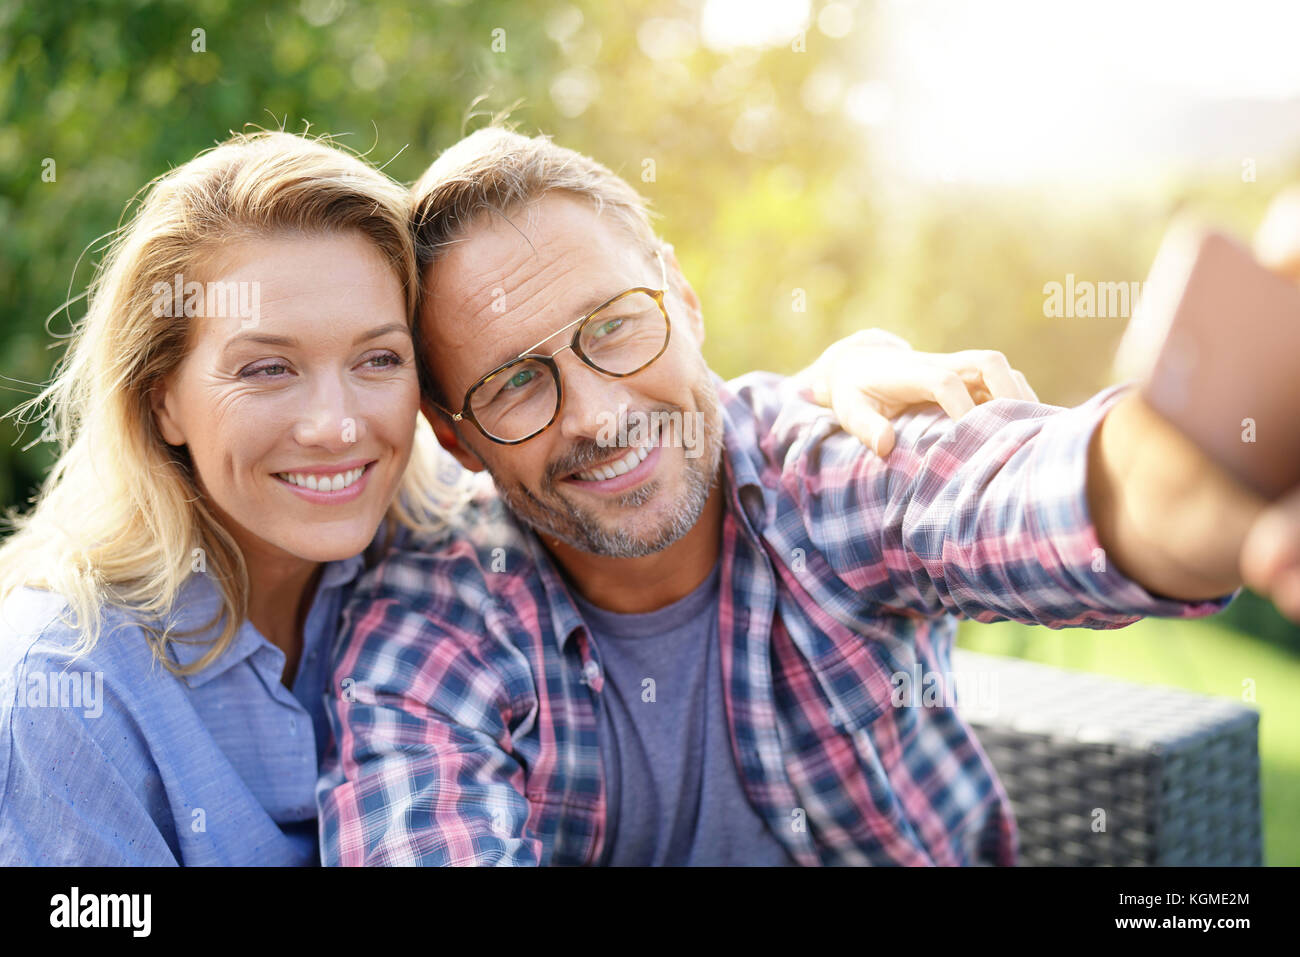 Retrato de la alegre pareja teniendo selfie imagen Imagen De Stock